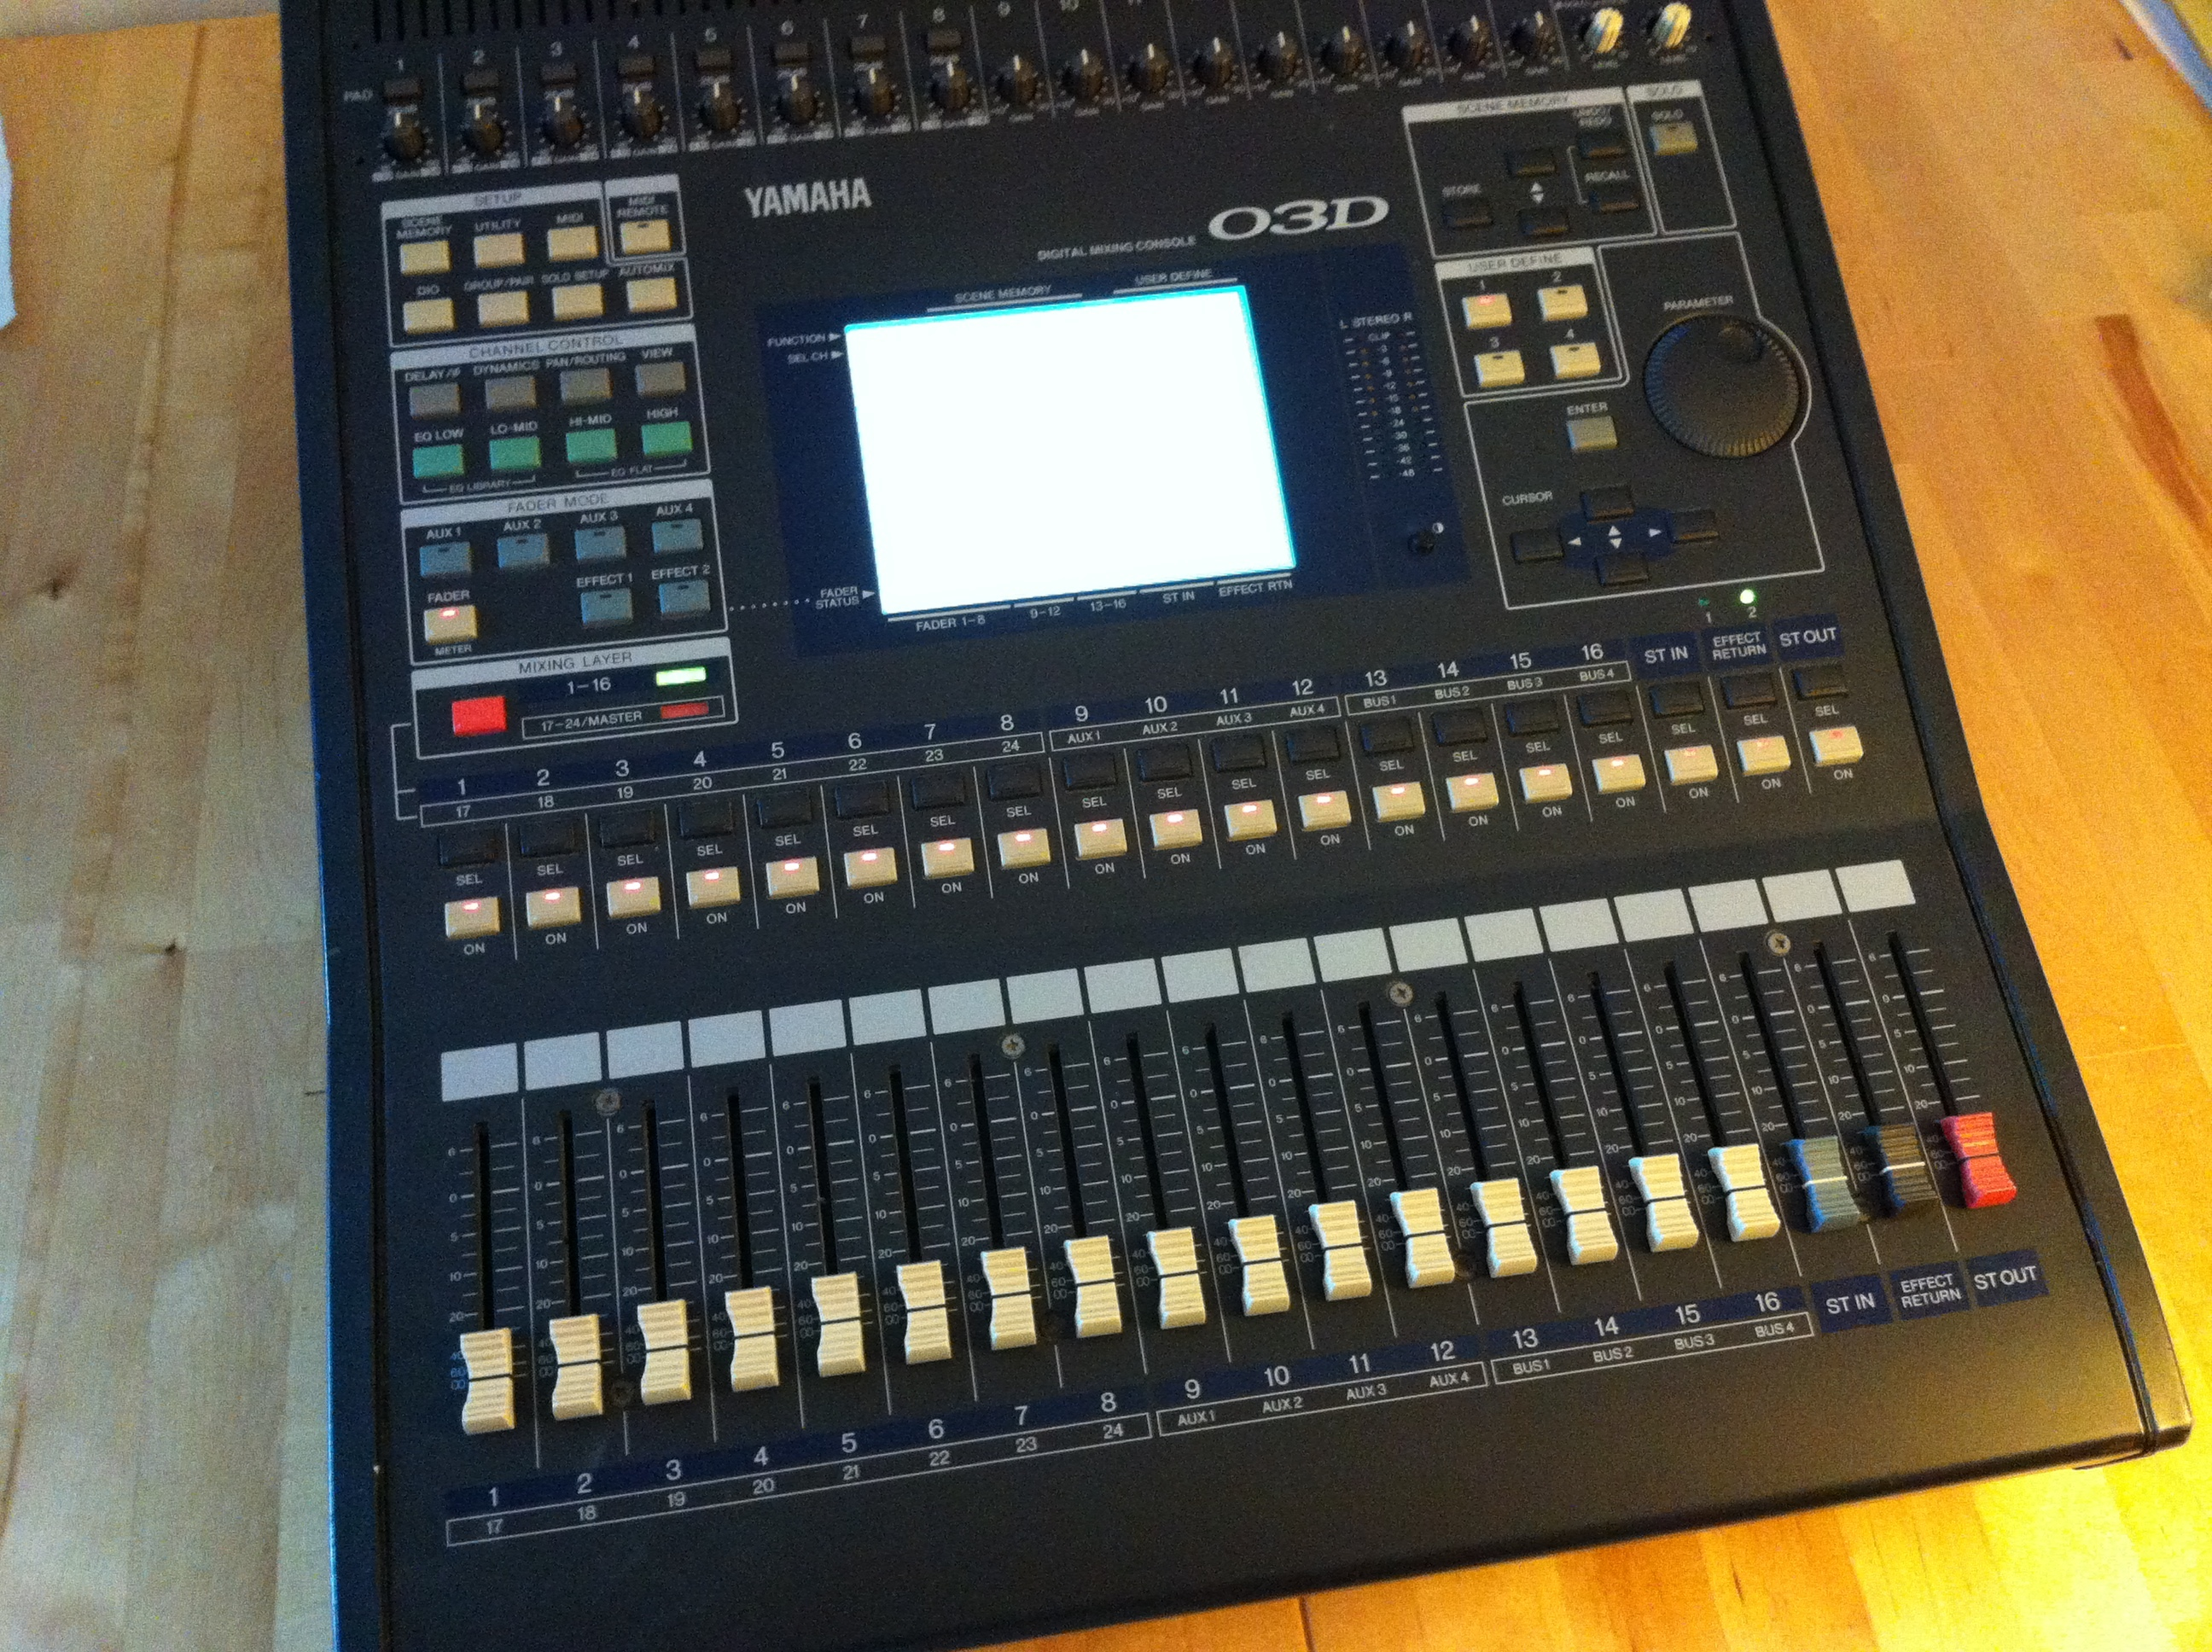 Yamaha 03d Digital Mixer Price : yamaha 03d image 411353 audiofanzine ~ Hamham.info Haus und Dekorationen